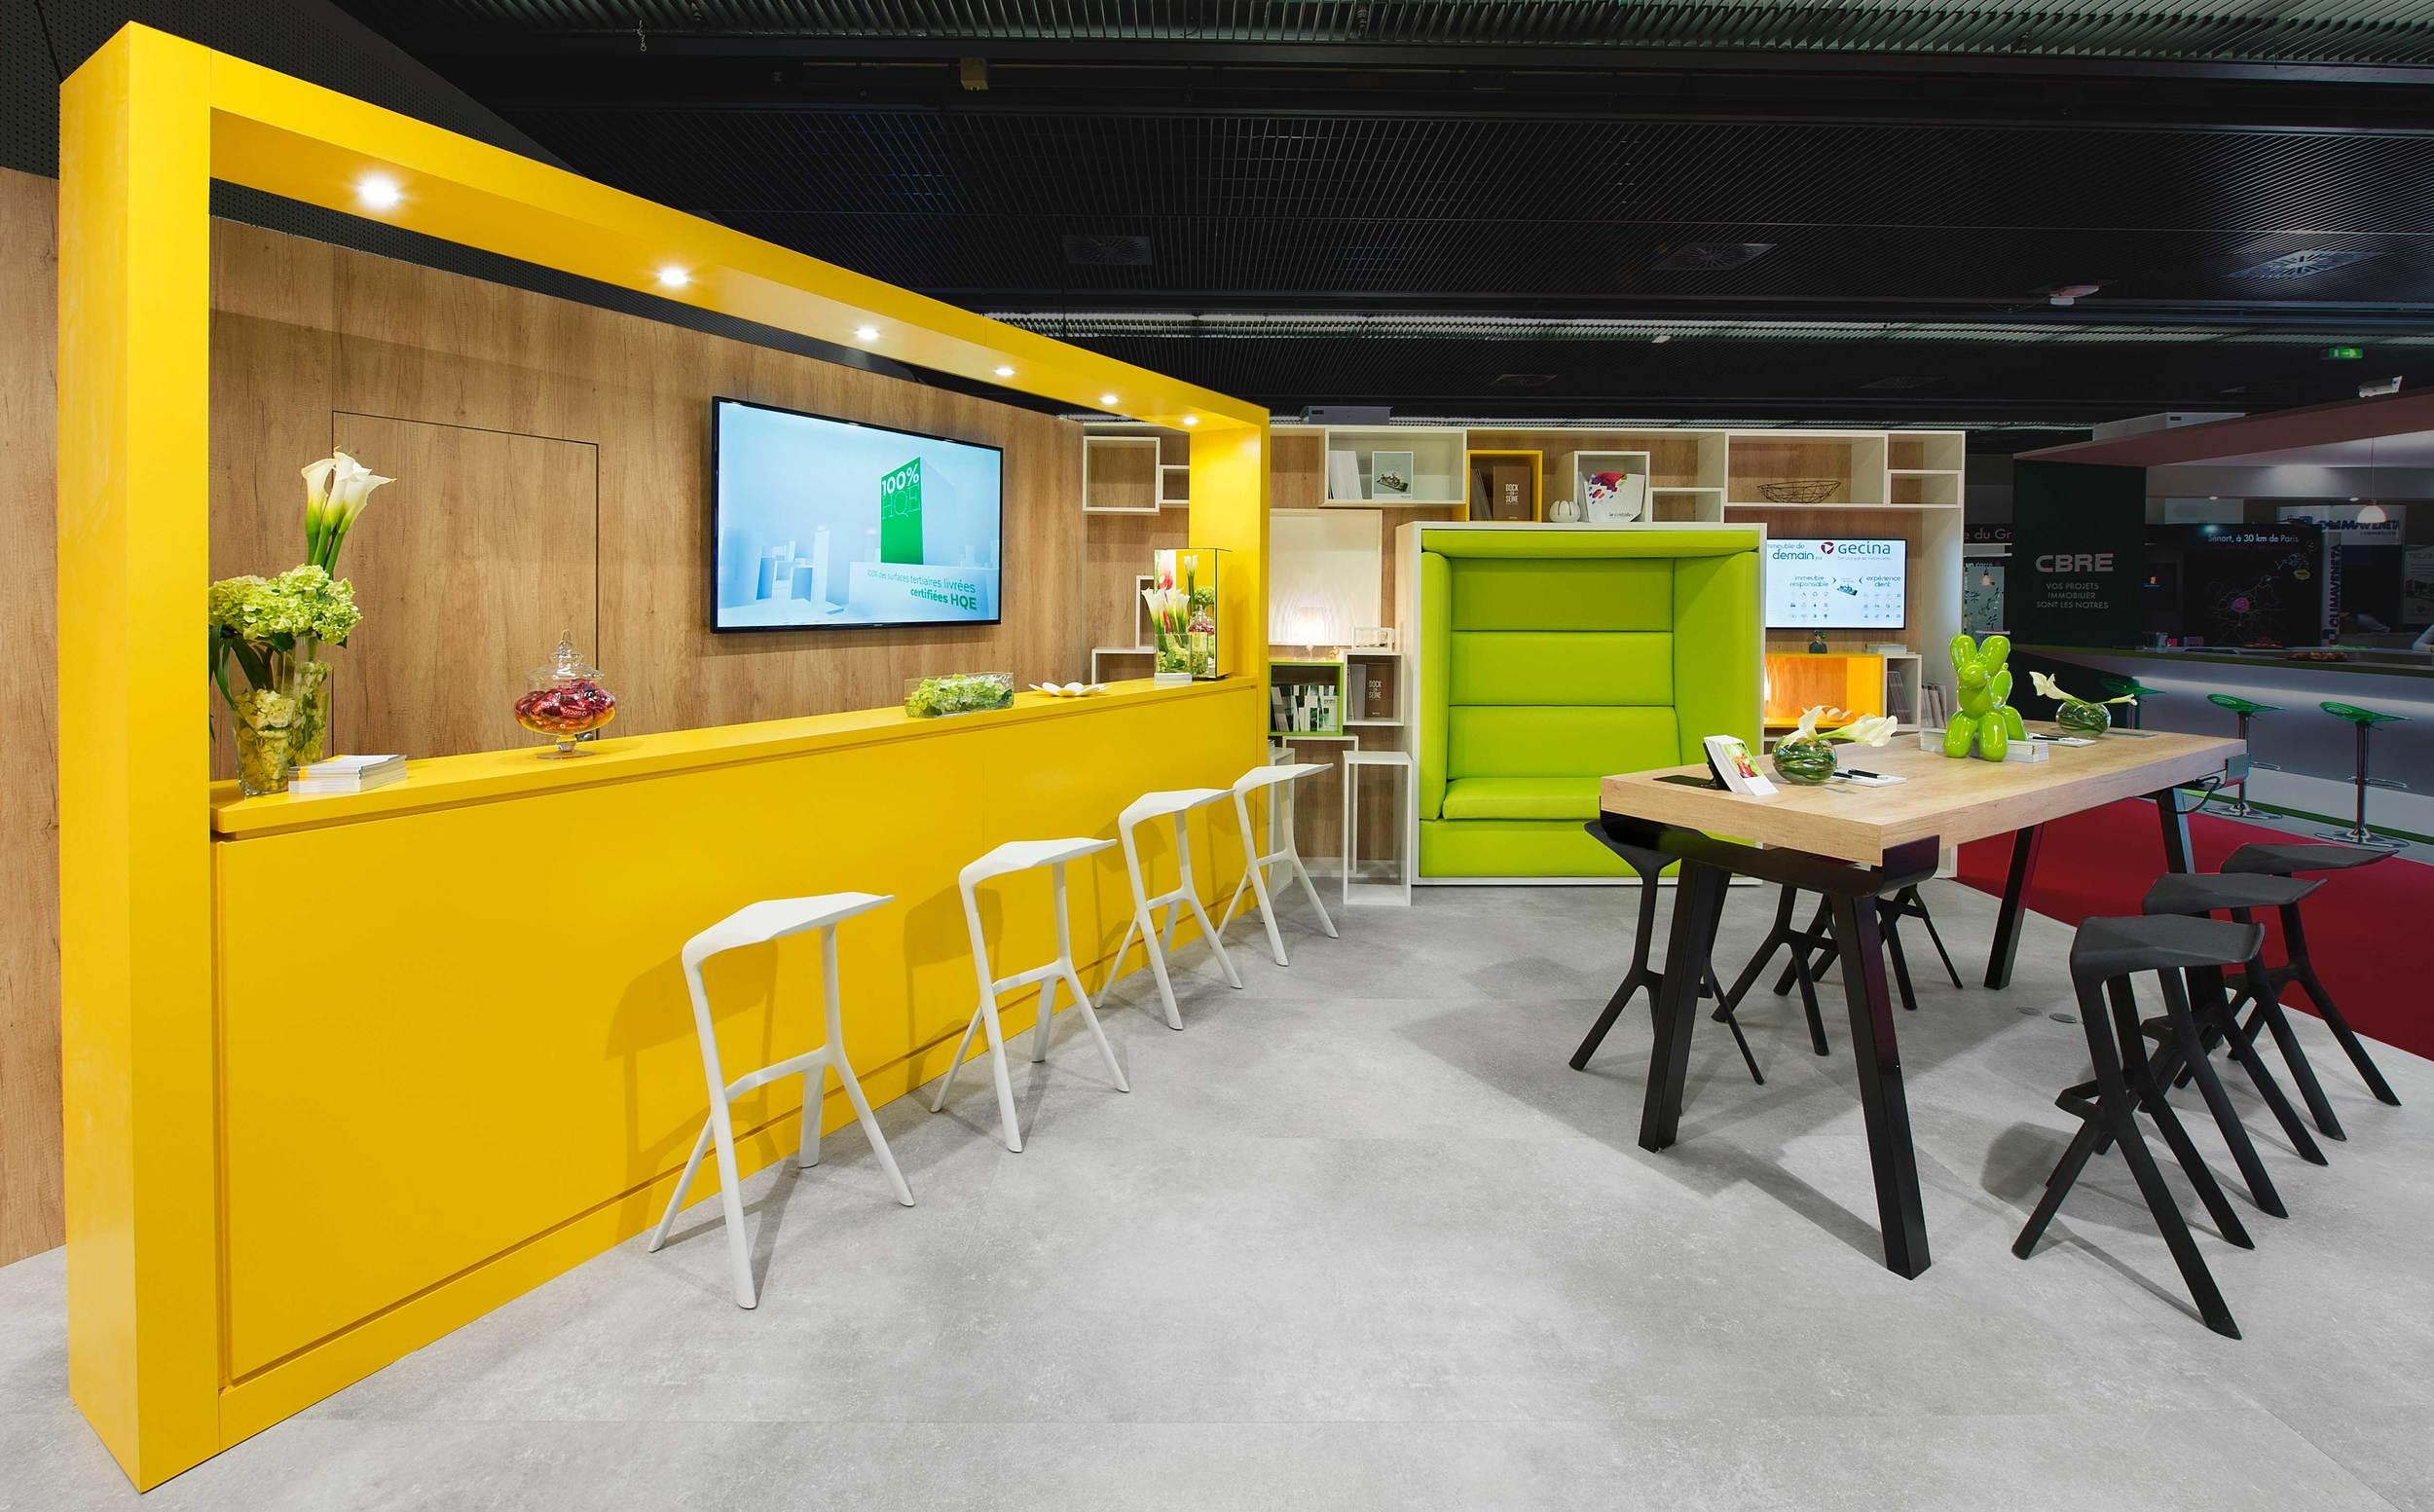 design-stand-gecina-salon-simi-paris-agence-narrative